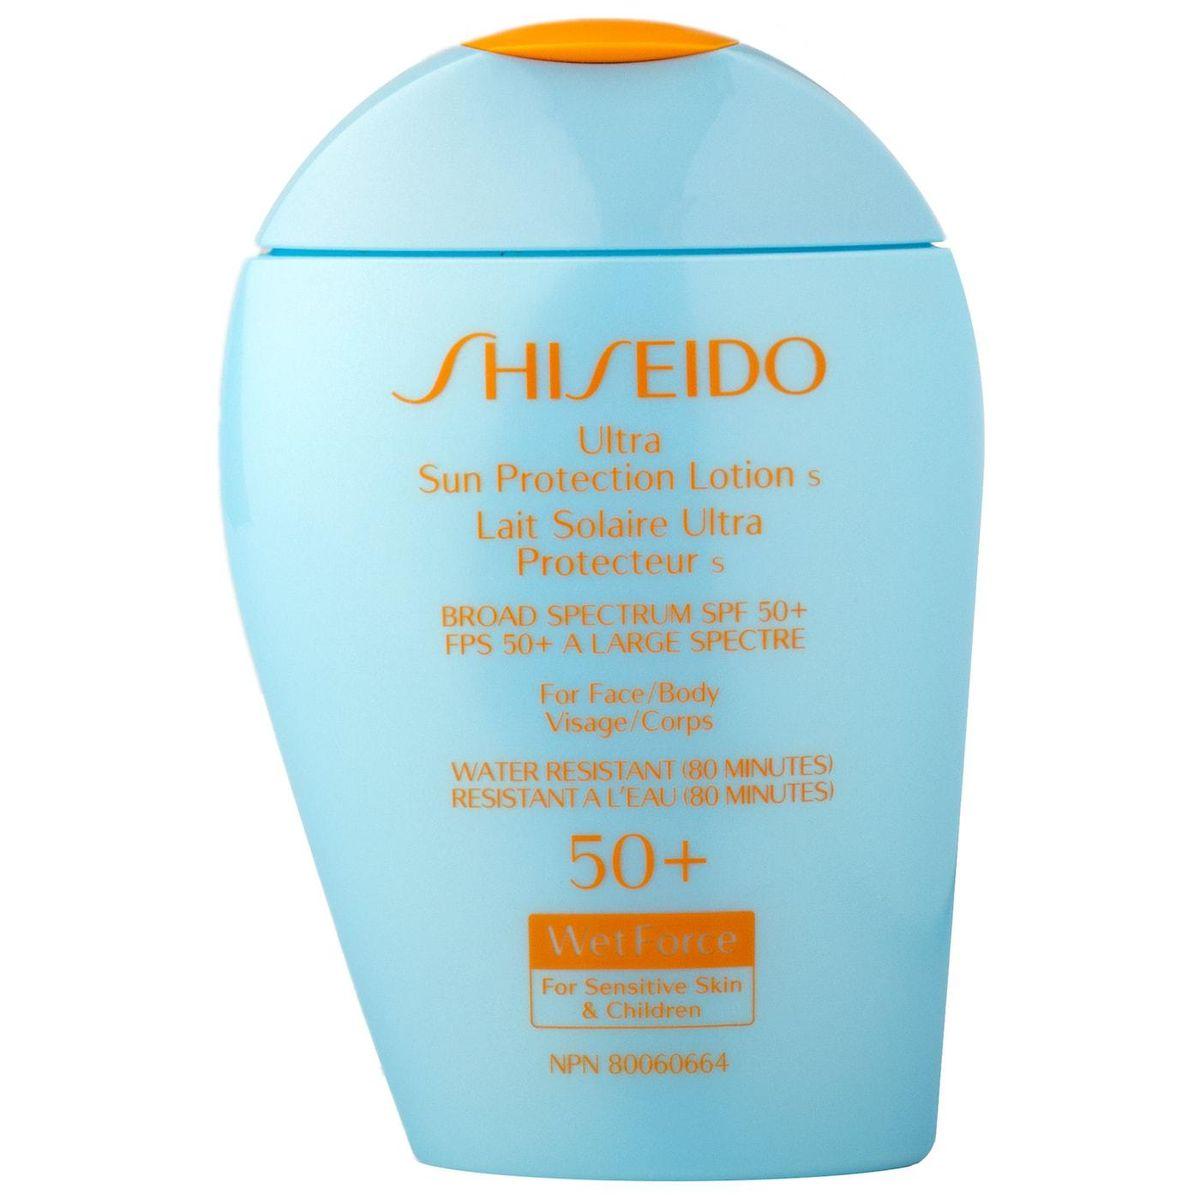 shiseido ultra sun protection lotion broad spectrum spf 50+ wetforce for sensitive skin and children